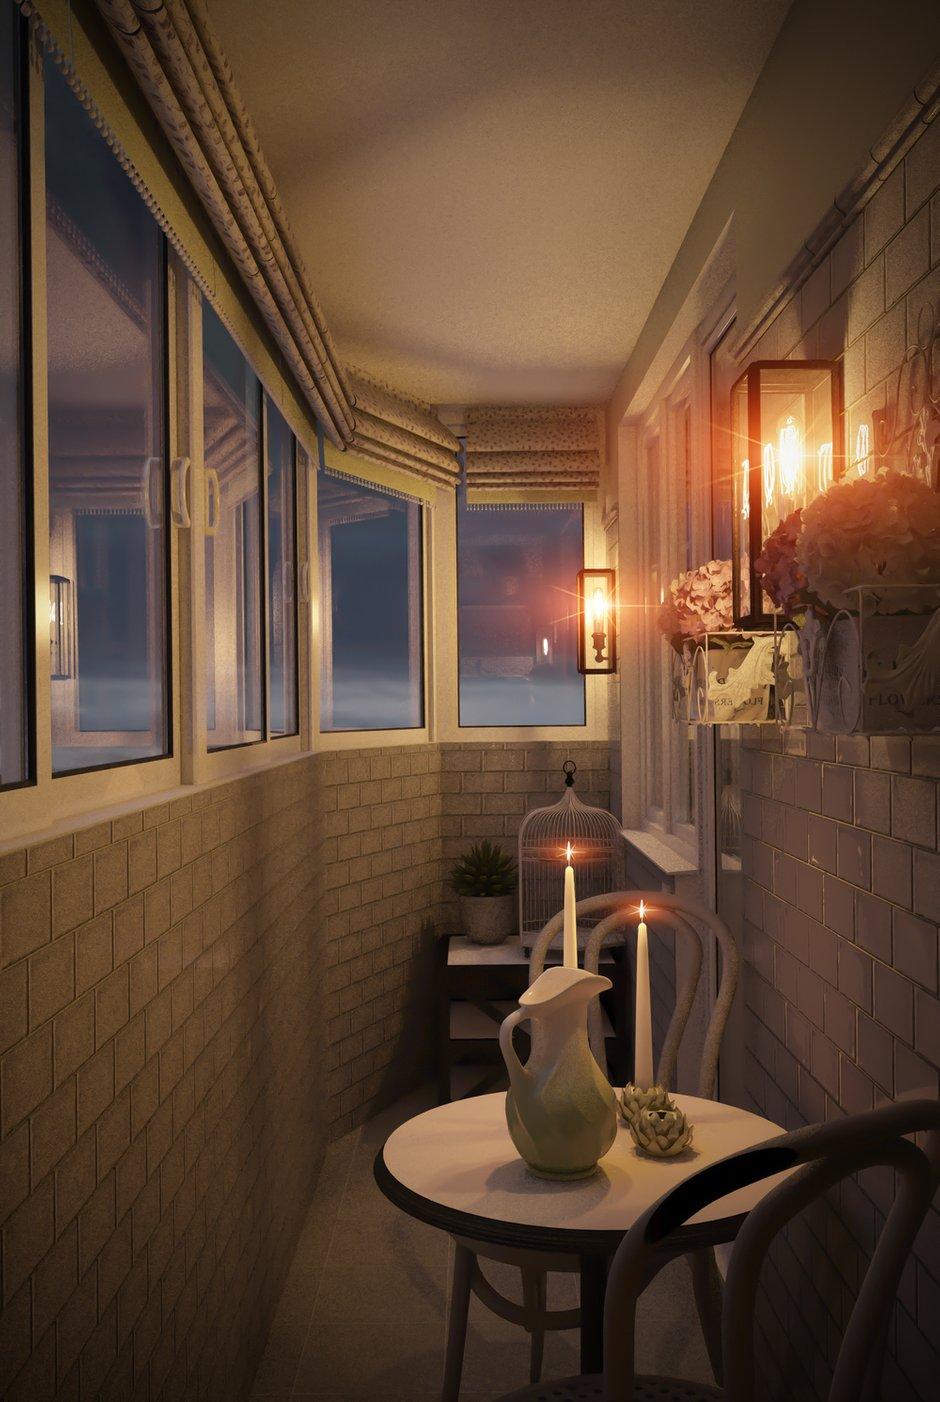 Фотография: Балкон, Терраса в стиле Прованс и Кантри, Интерьер комнат – фото на INMYROOM